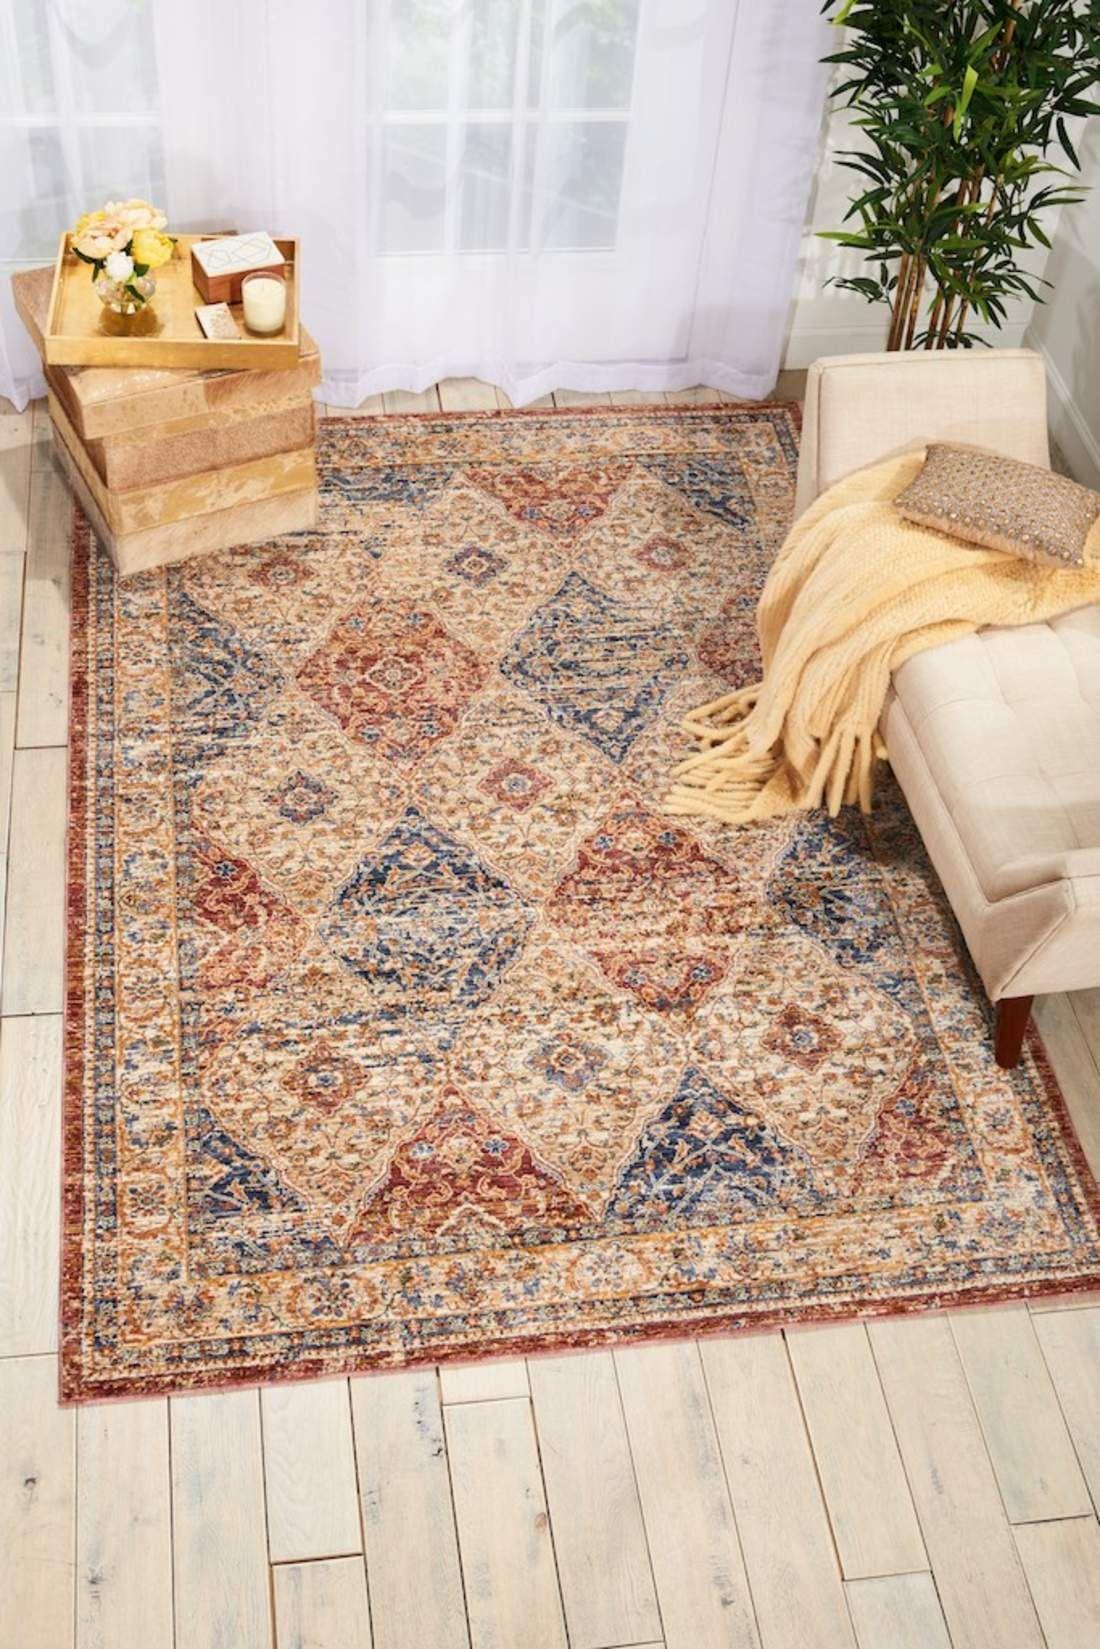 Lagos Multi Lag05 Area Rugs Nourison Round Carpet Living Room #round #carpets #for #living #room